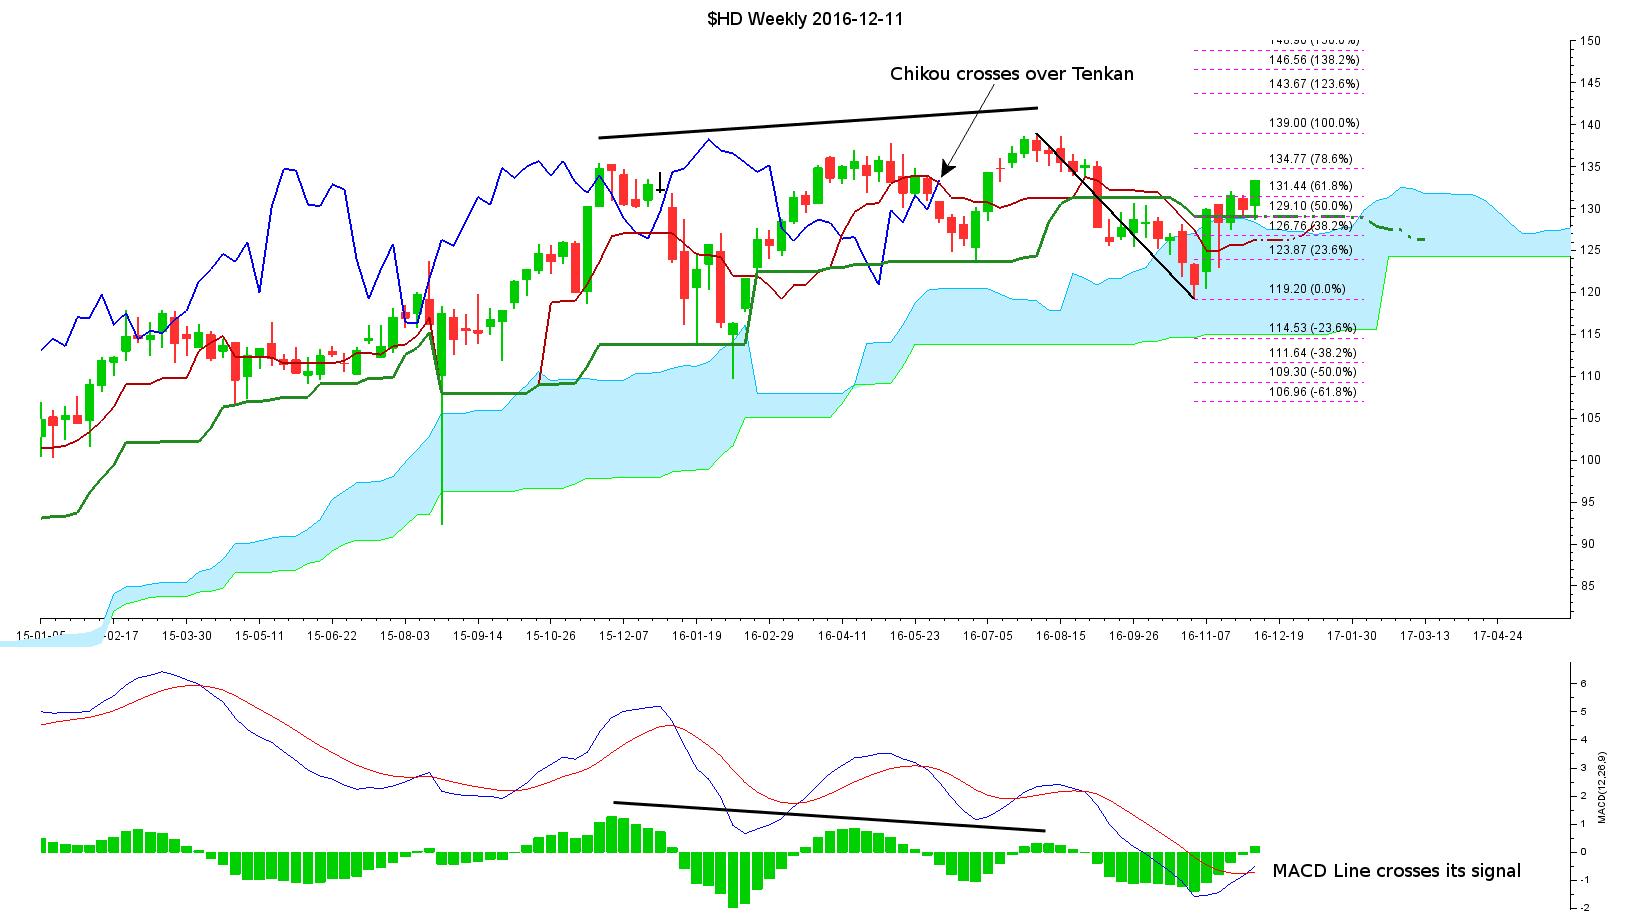 Trading chart signals